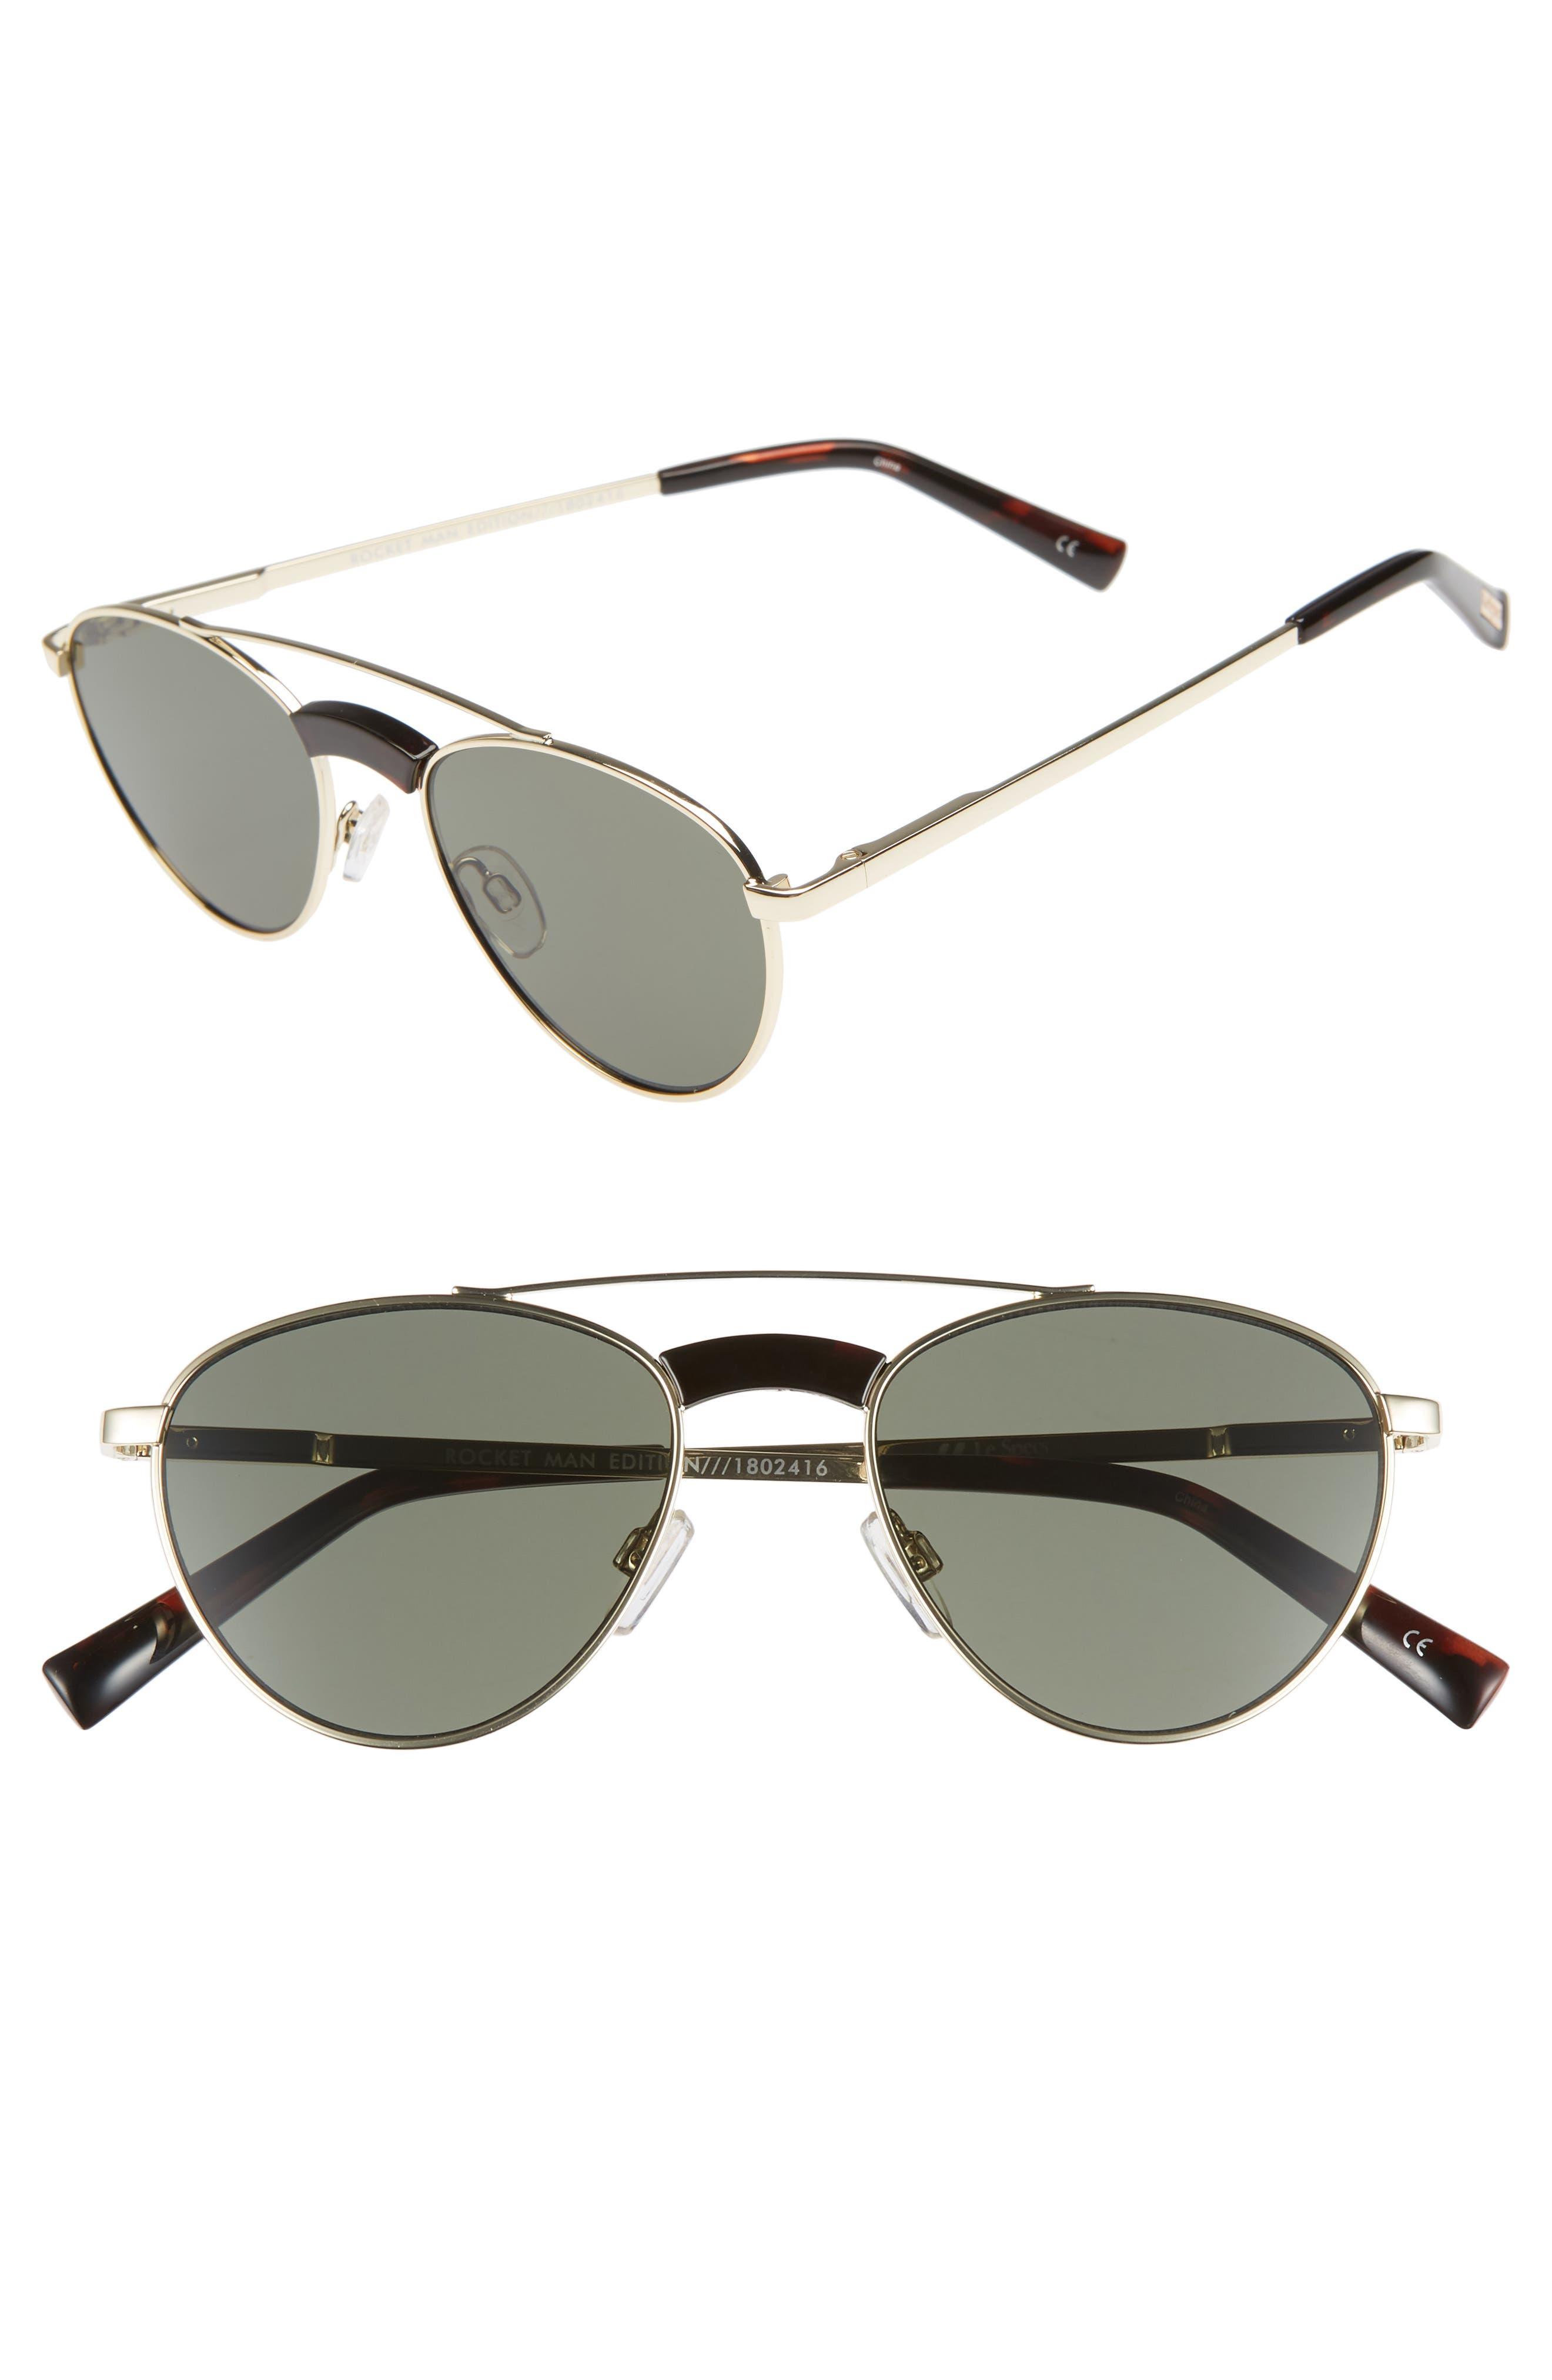 Rocket Man 52mm Aviator Sunglasses,                             Main thumbnail 1, color,                             BRIGHT GOLD